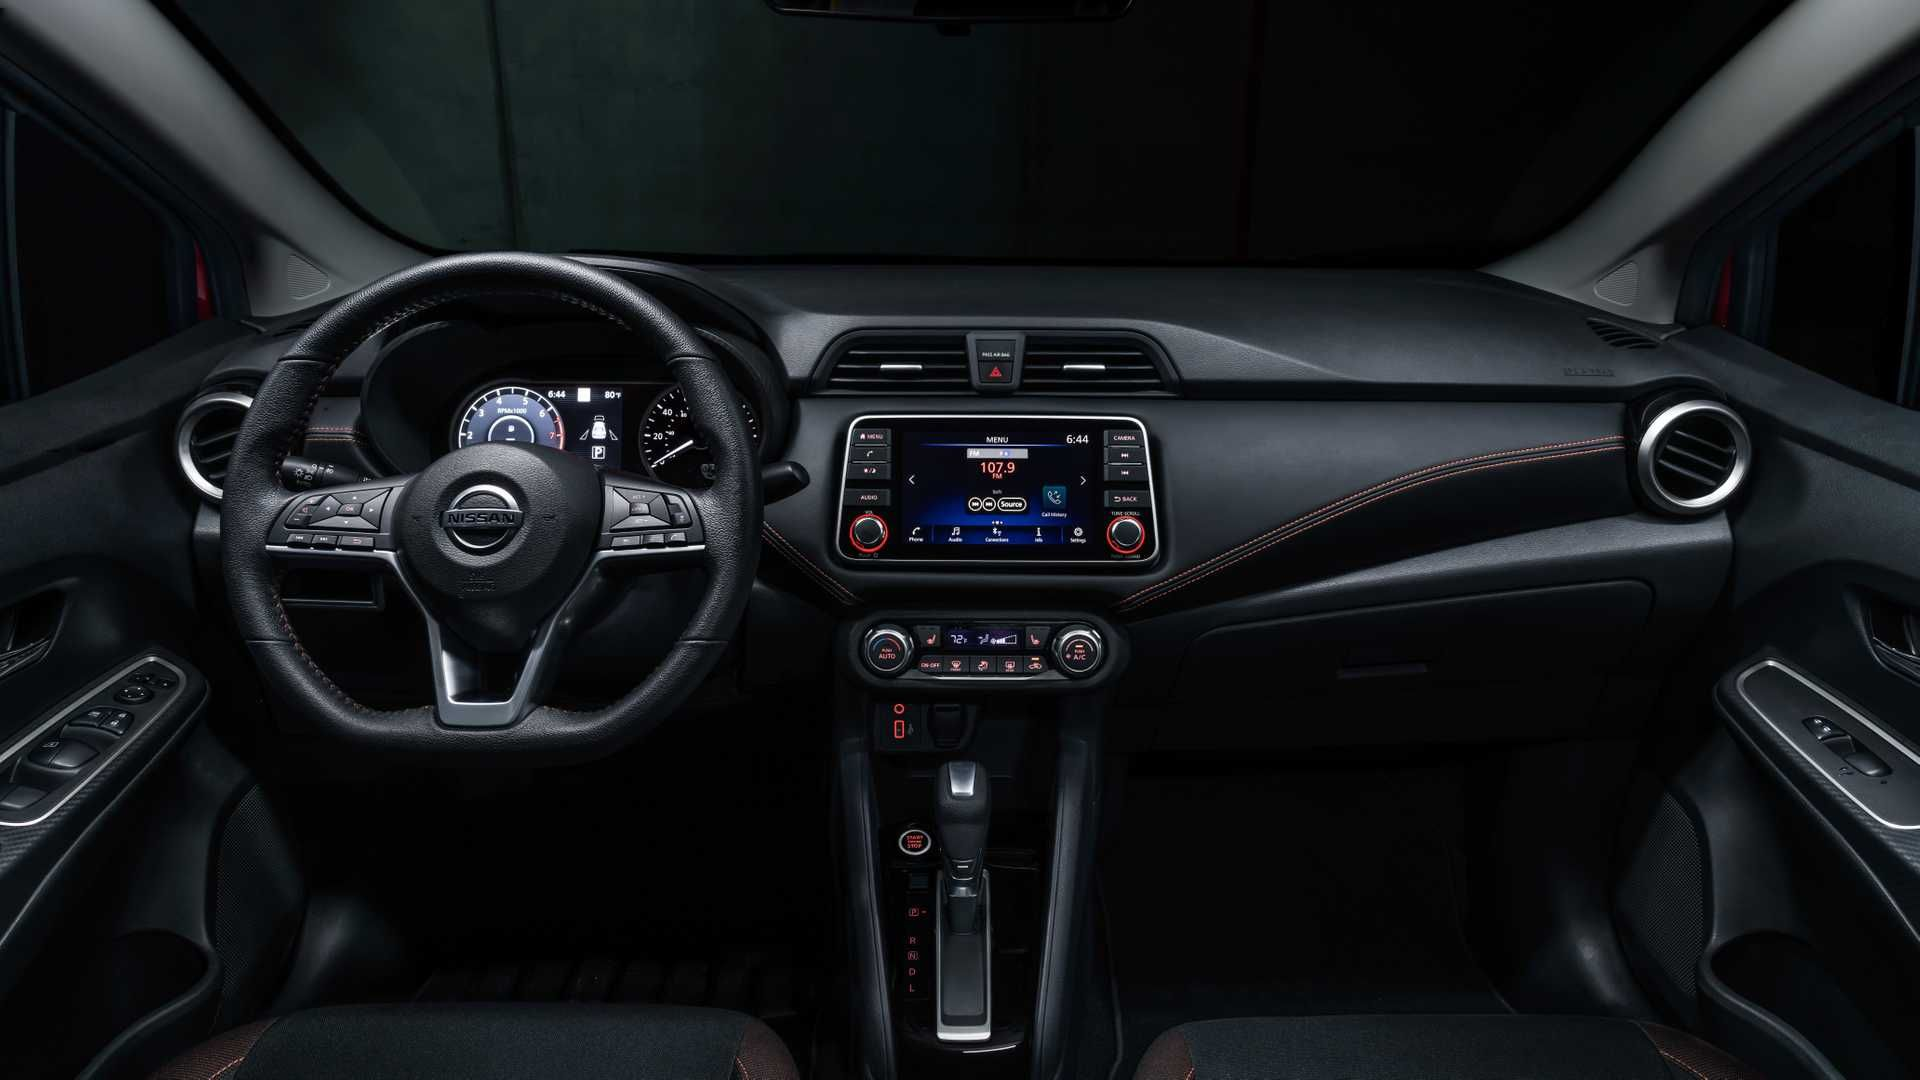 Perfect Nissan Versa Advance 2020 Interior And View Di 2020